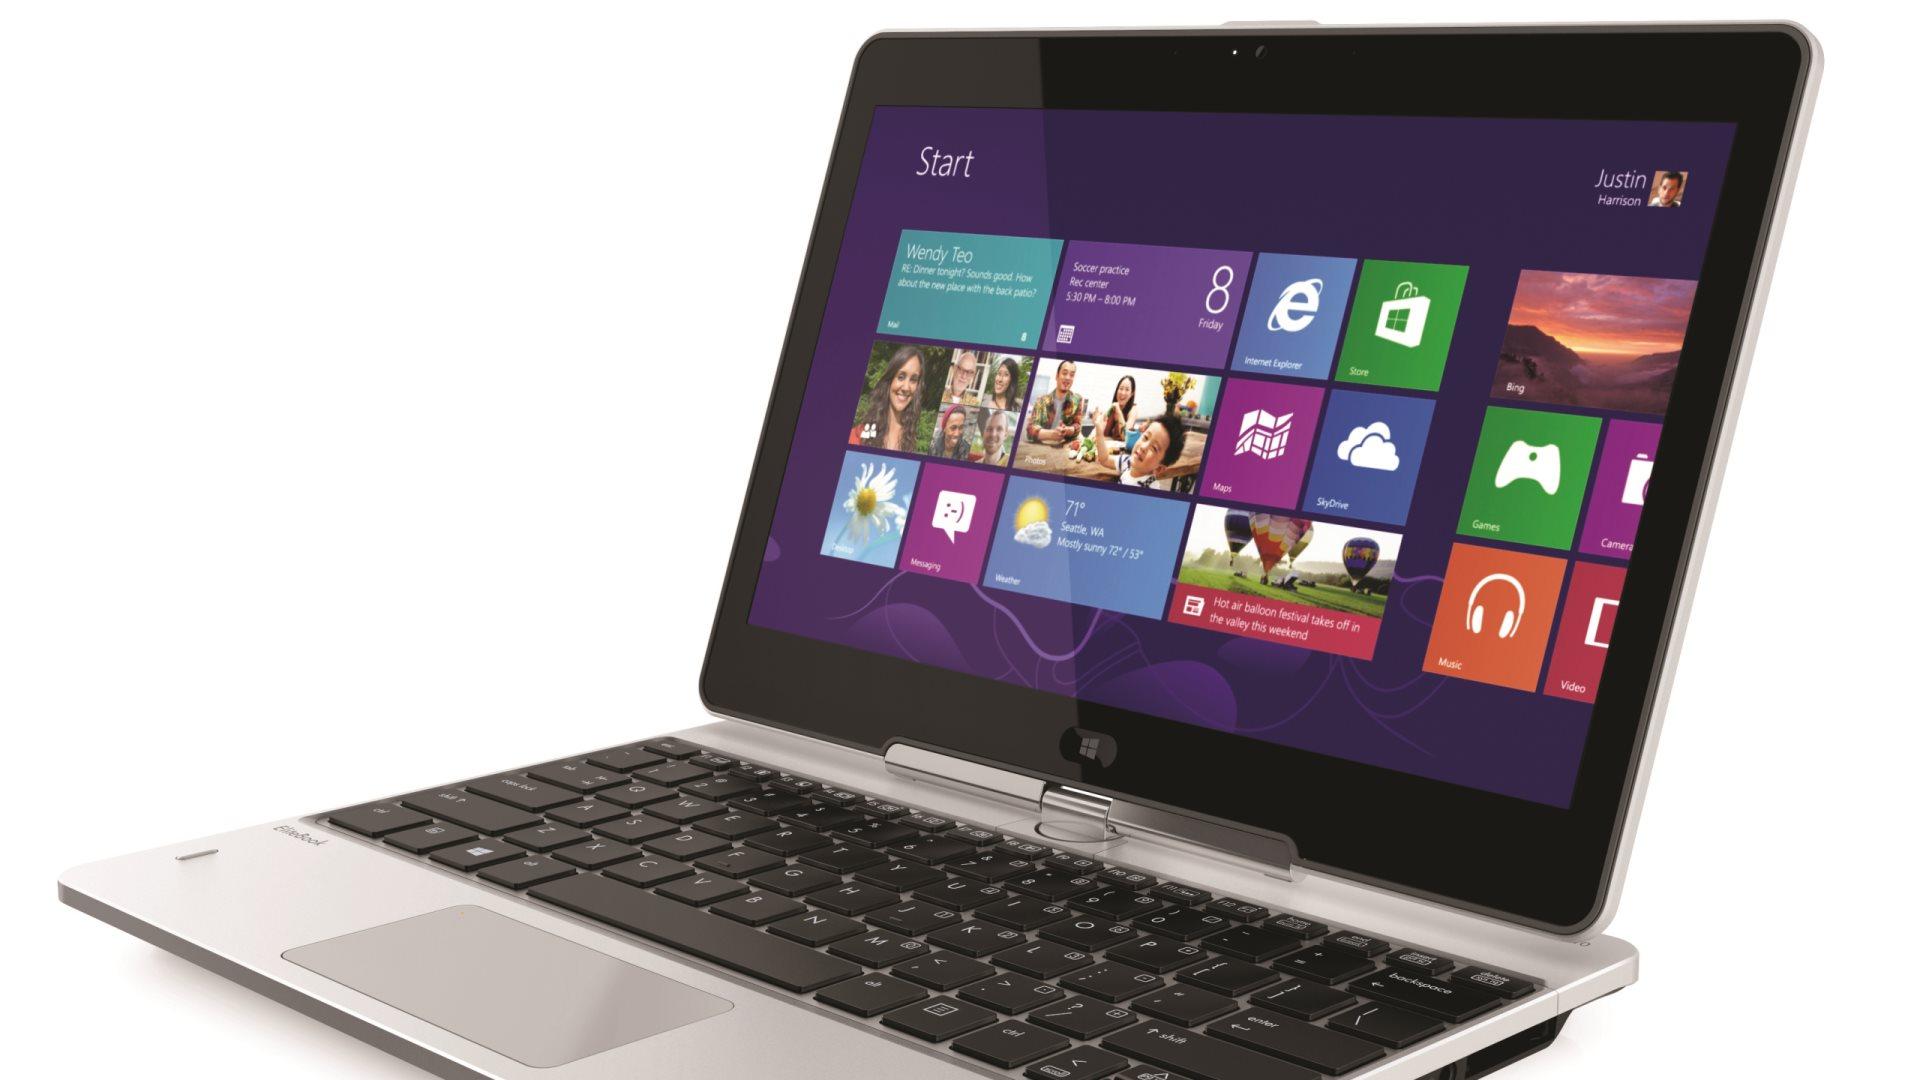 Hp notebook desktop - Hd Wallpaper Elitebook Revolve Is Hp S Enterprise Class Swivel Touchscreen Notebook To Tablet